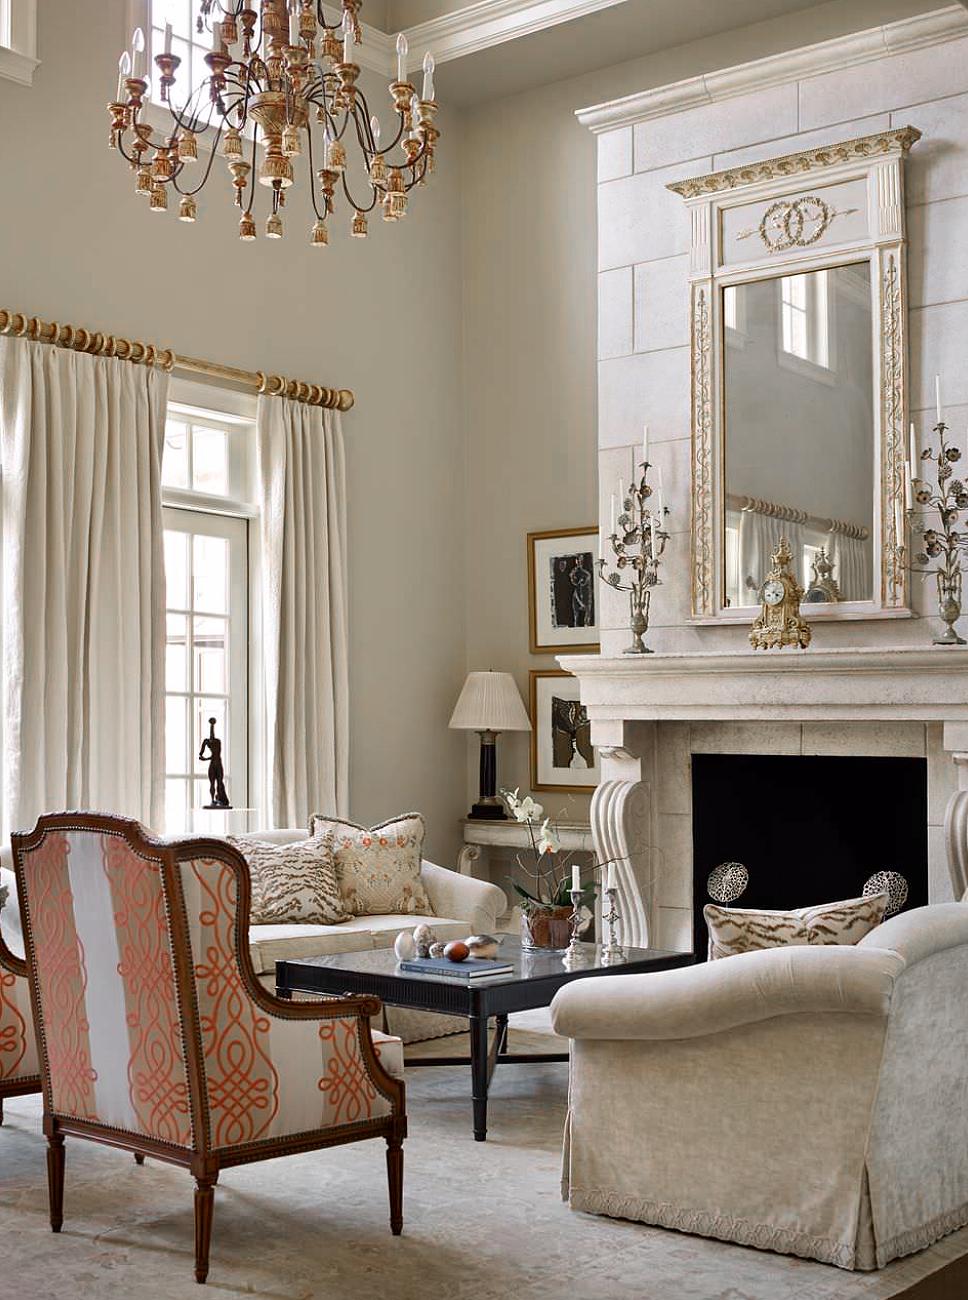 Cozy Victorian Style Beige Living Room Decor French Country Living Room Beige Living Room Decor Beige Living Rooms